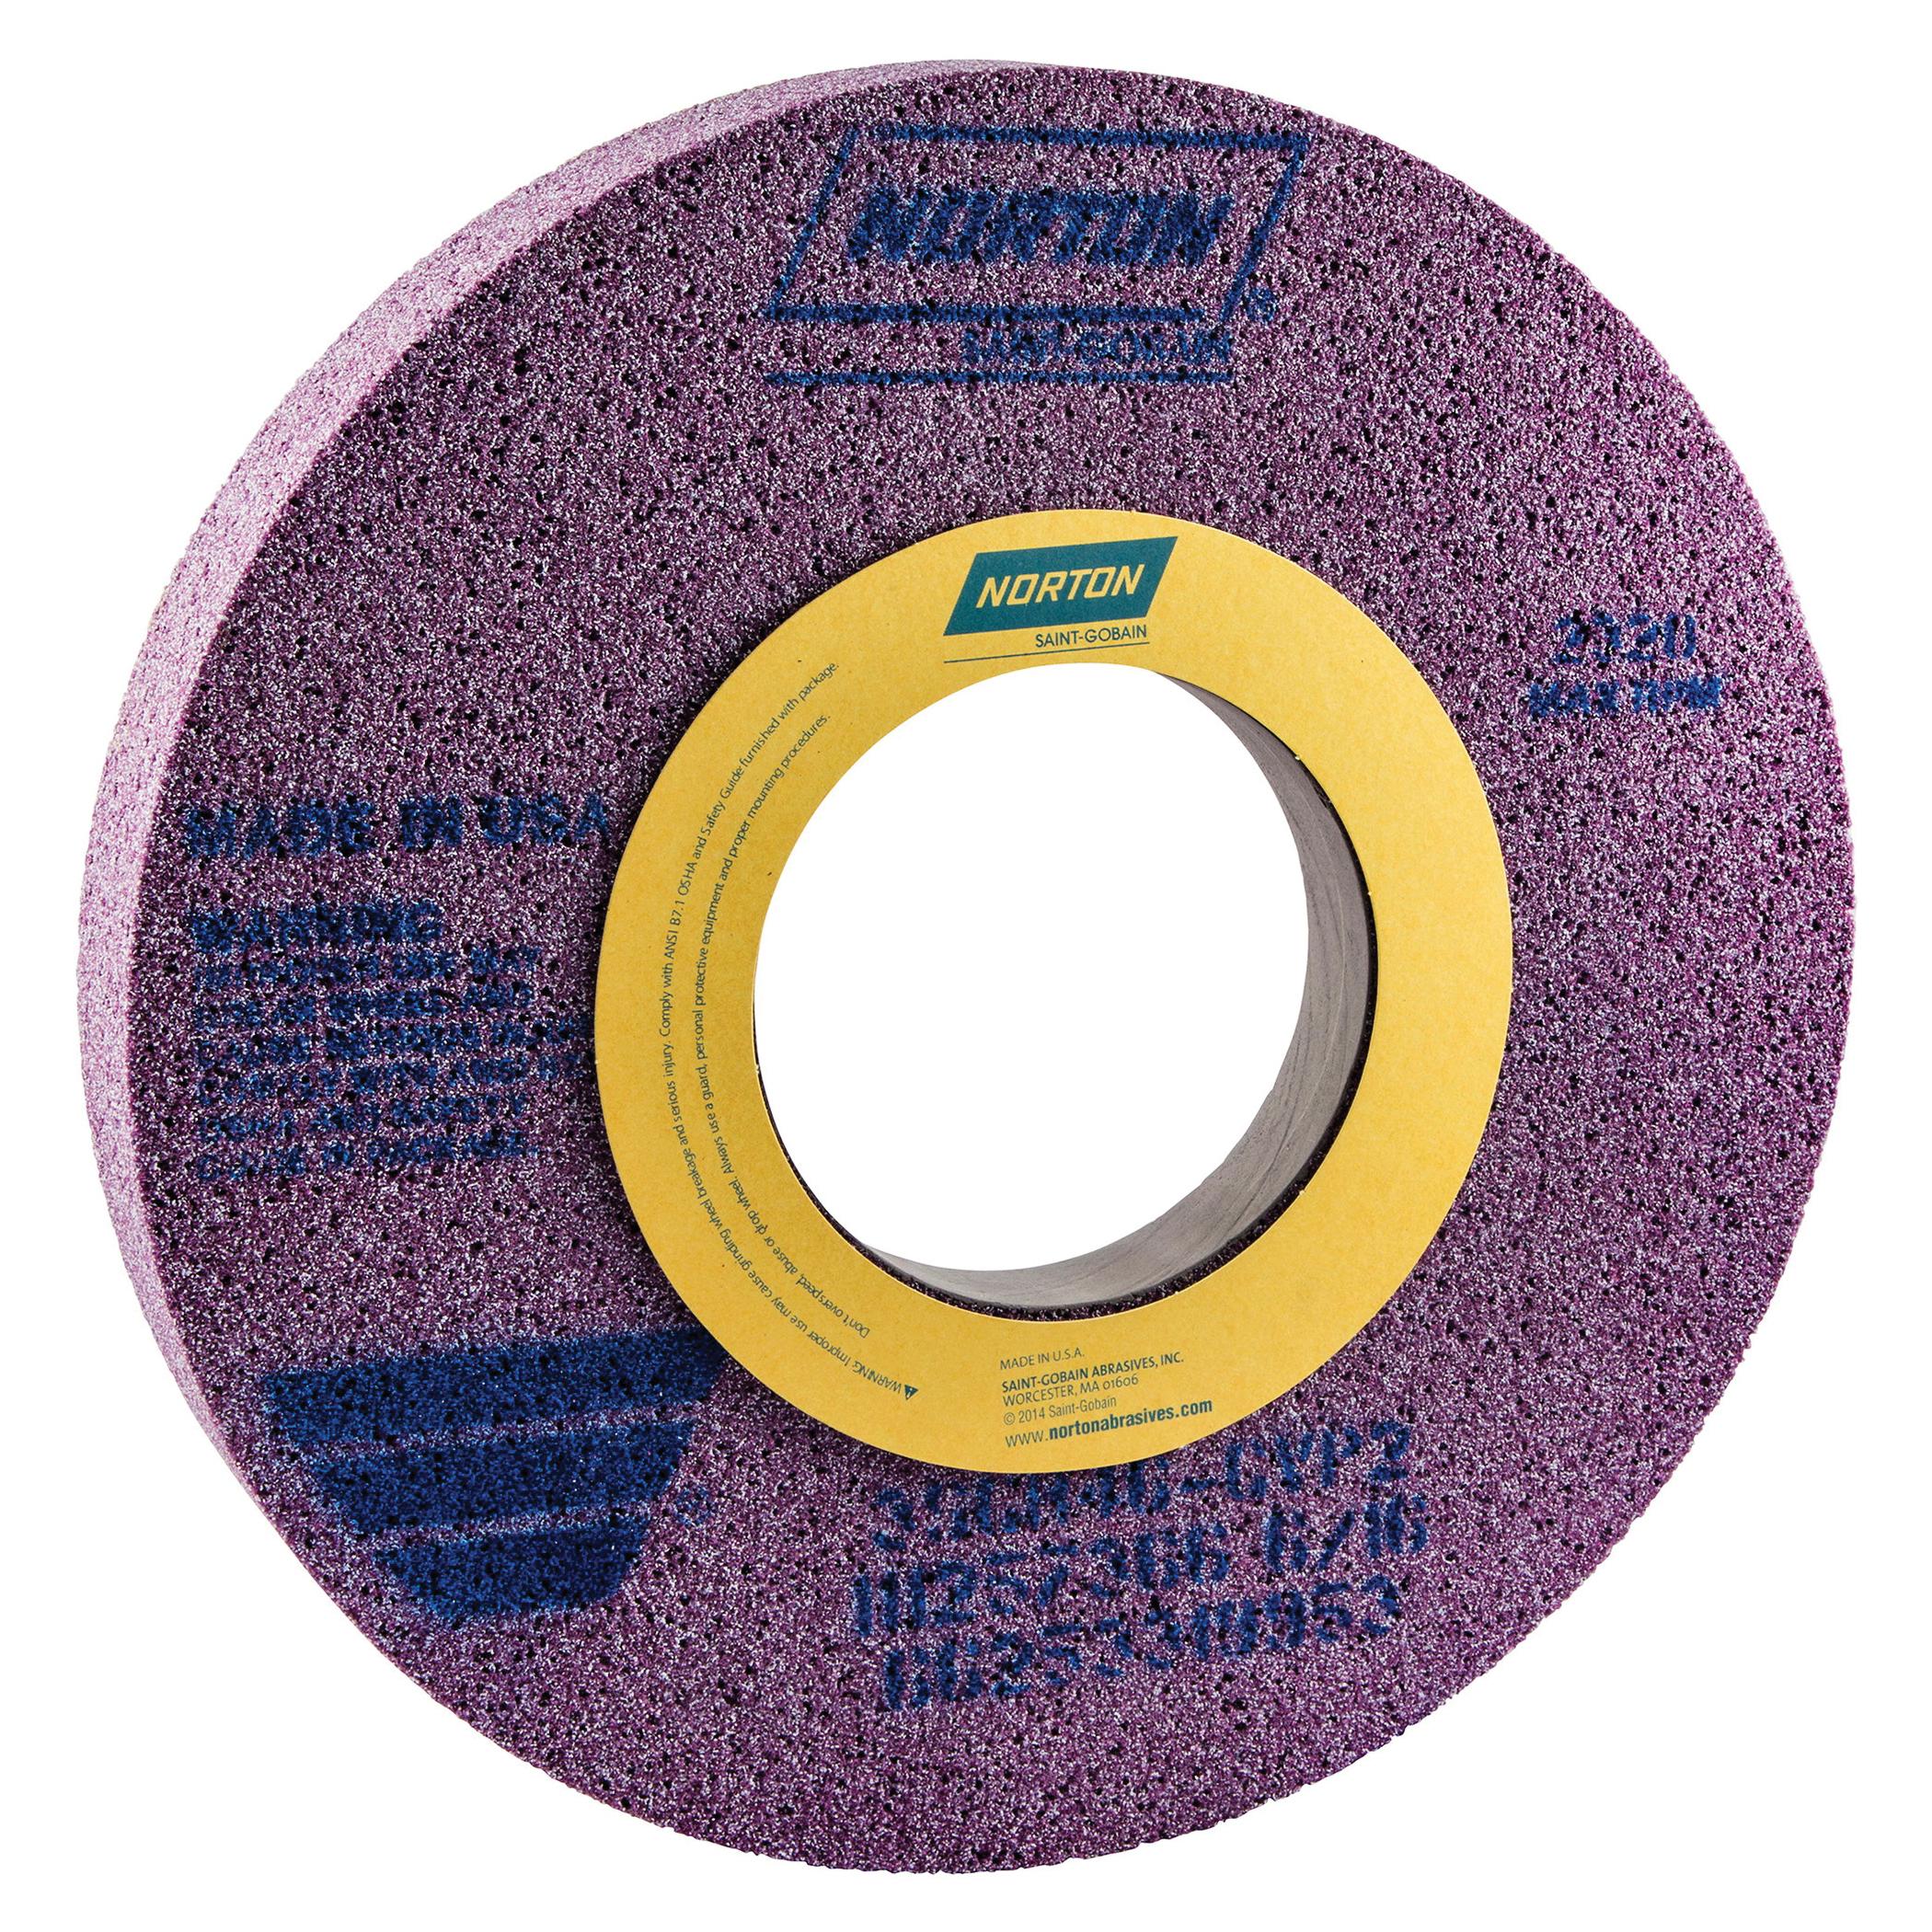 Norton® 66253319953 3SGR 1-Side Recessed Toolroom Wheel, 14 in Dia x 1-1/2 in THK, 5 in Center Hole, 46 Grit, Ceramic Alumina Abrasive